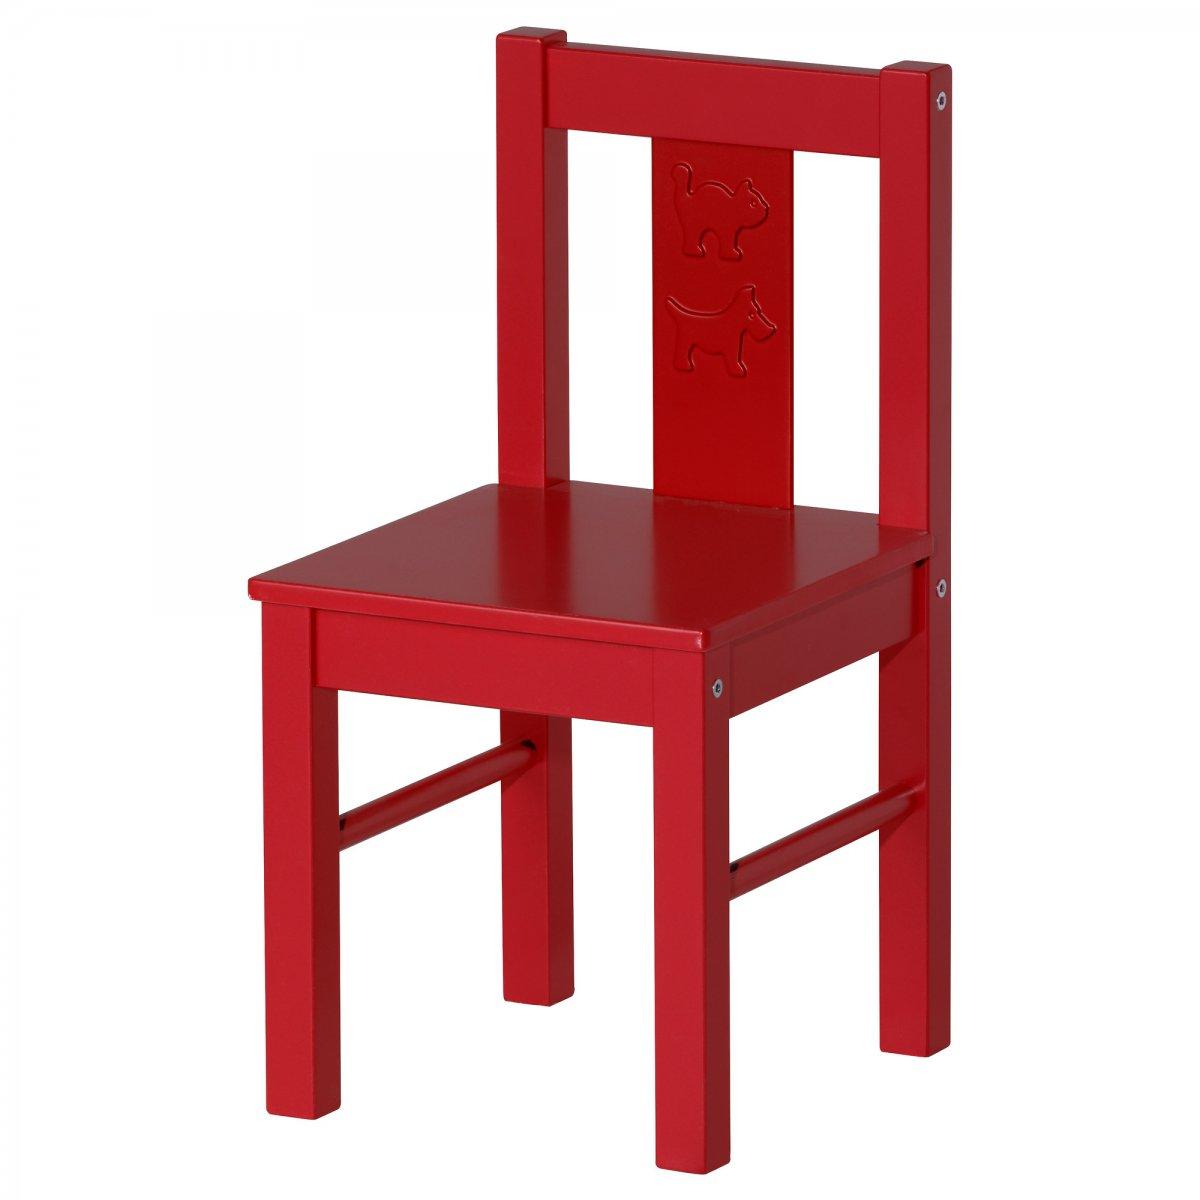 Im genes de muebles infantiles ikea mobiliario para ni os kritter de ikea - Ikea mobiliario para ninos ...